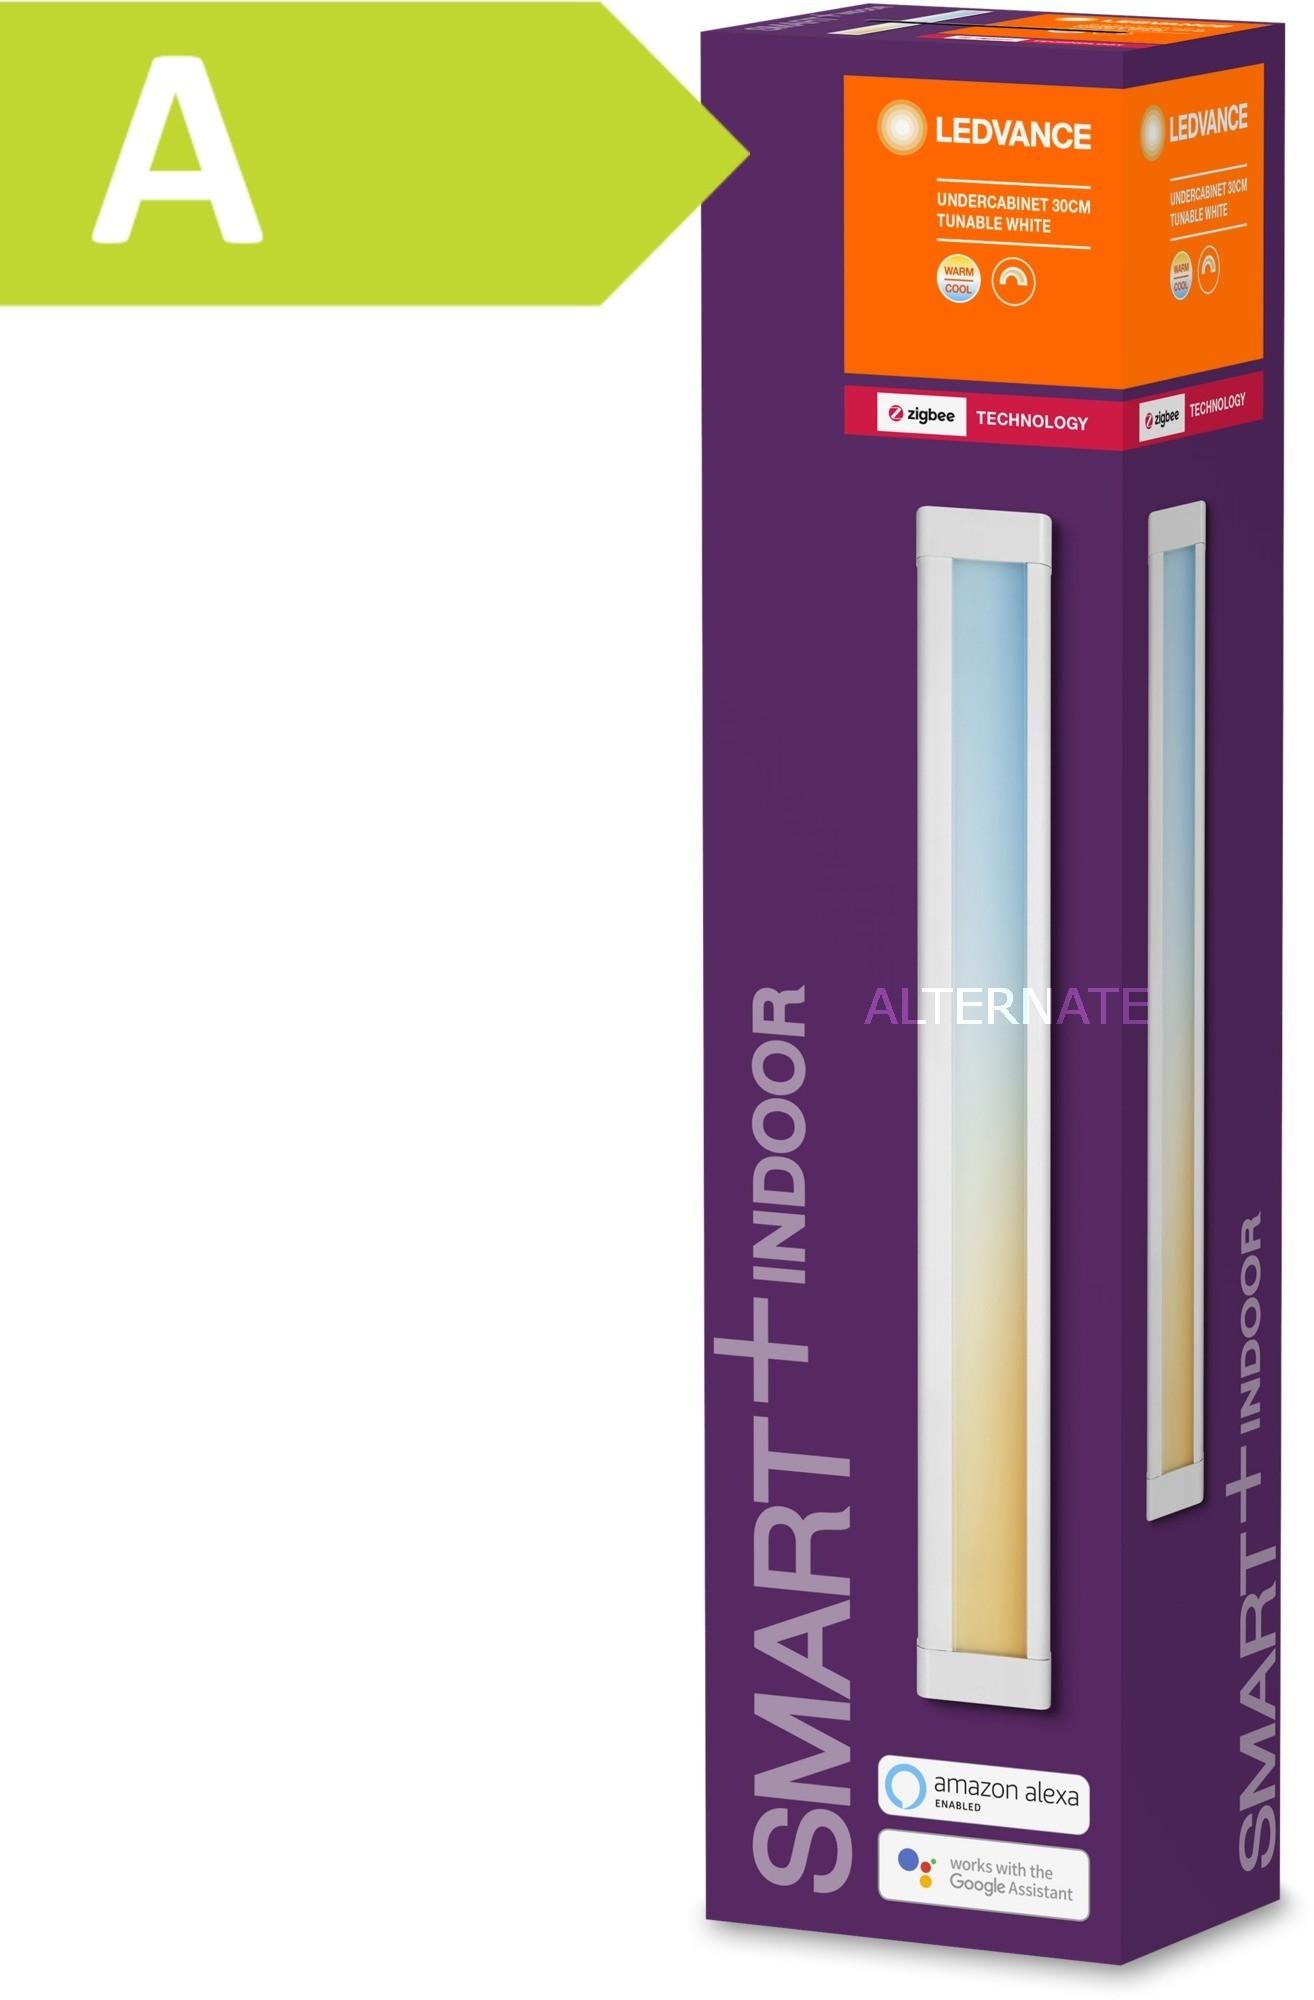 LEDVANCE SMART+ Undercabinet Tunable White Smart panel Biały ZigBee 6 W, LED light